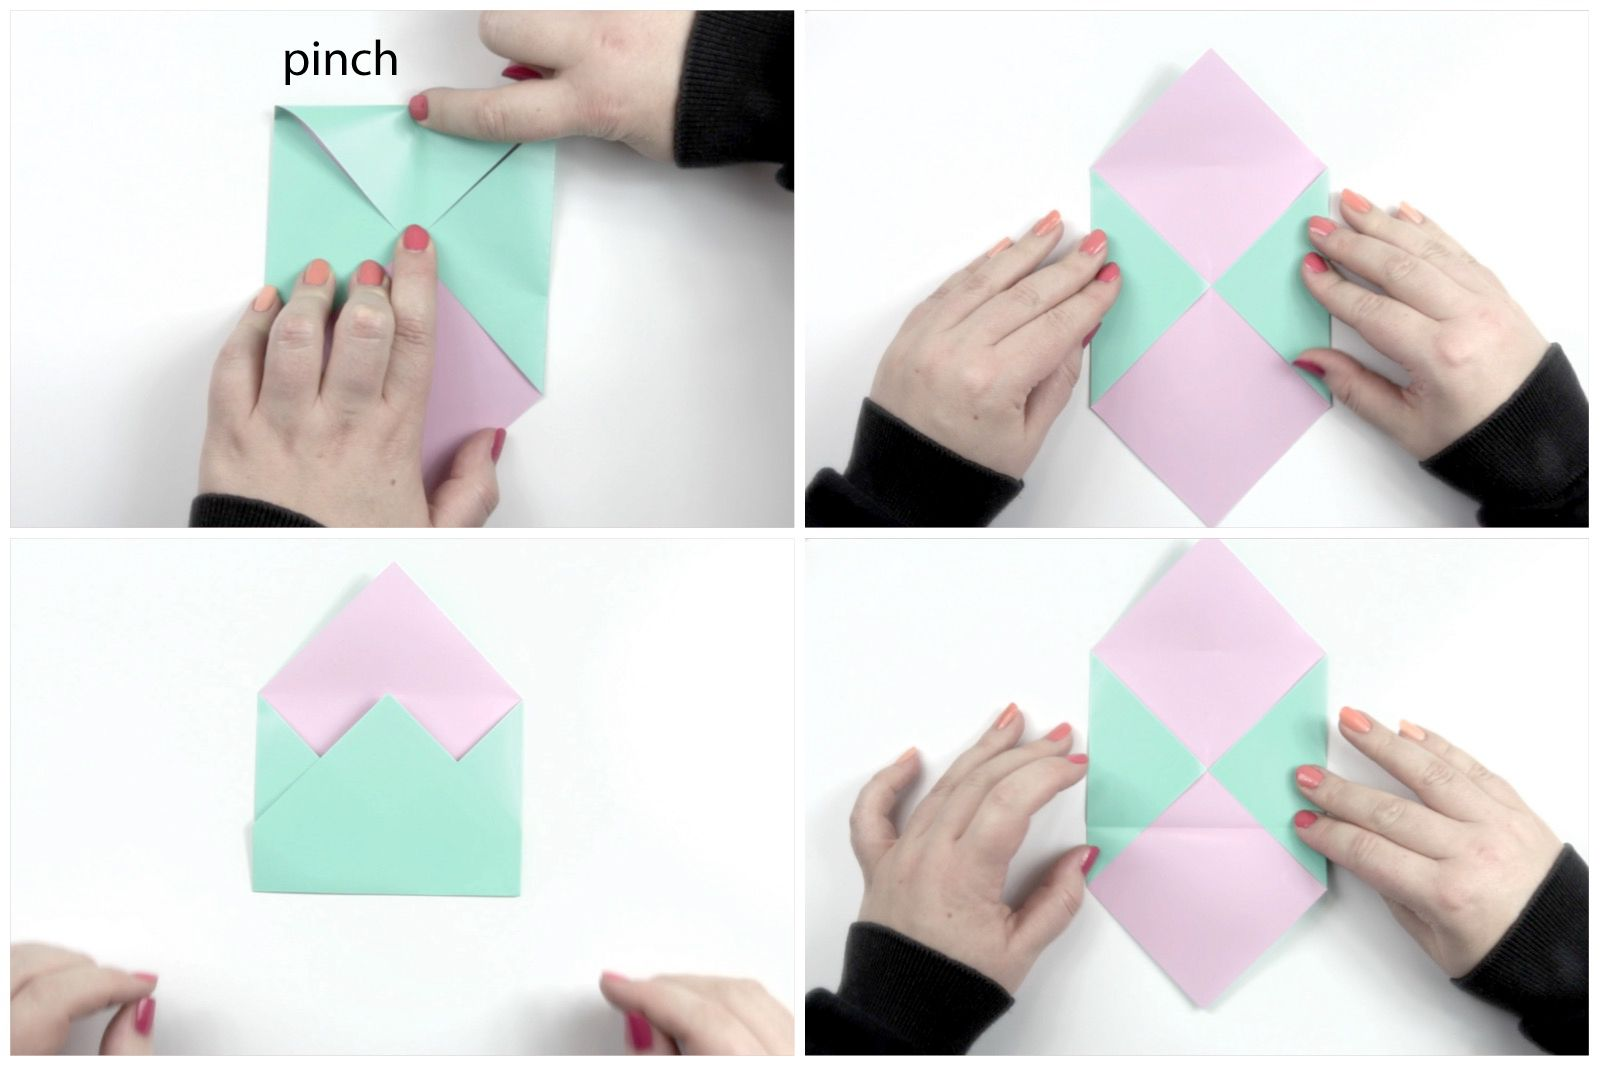 Folding an origami paper envelope